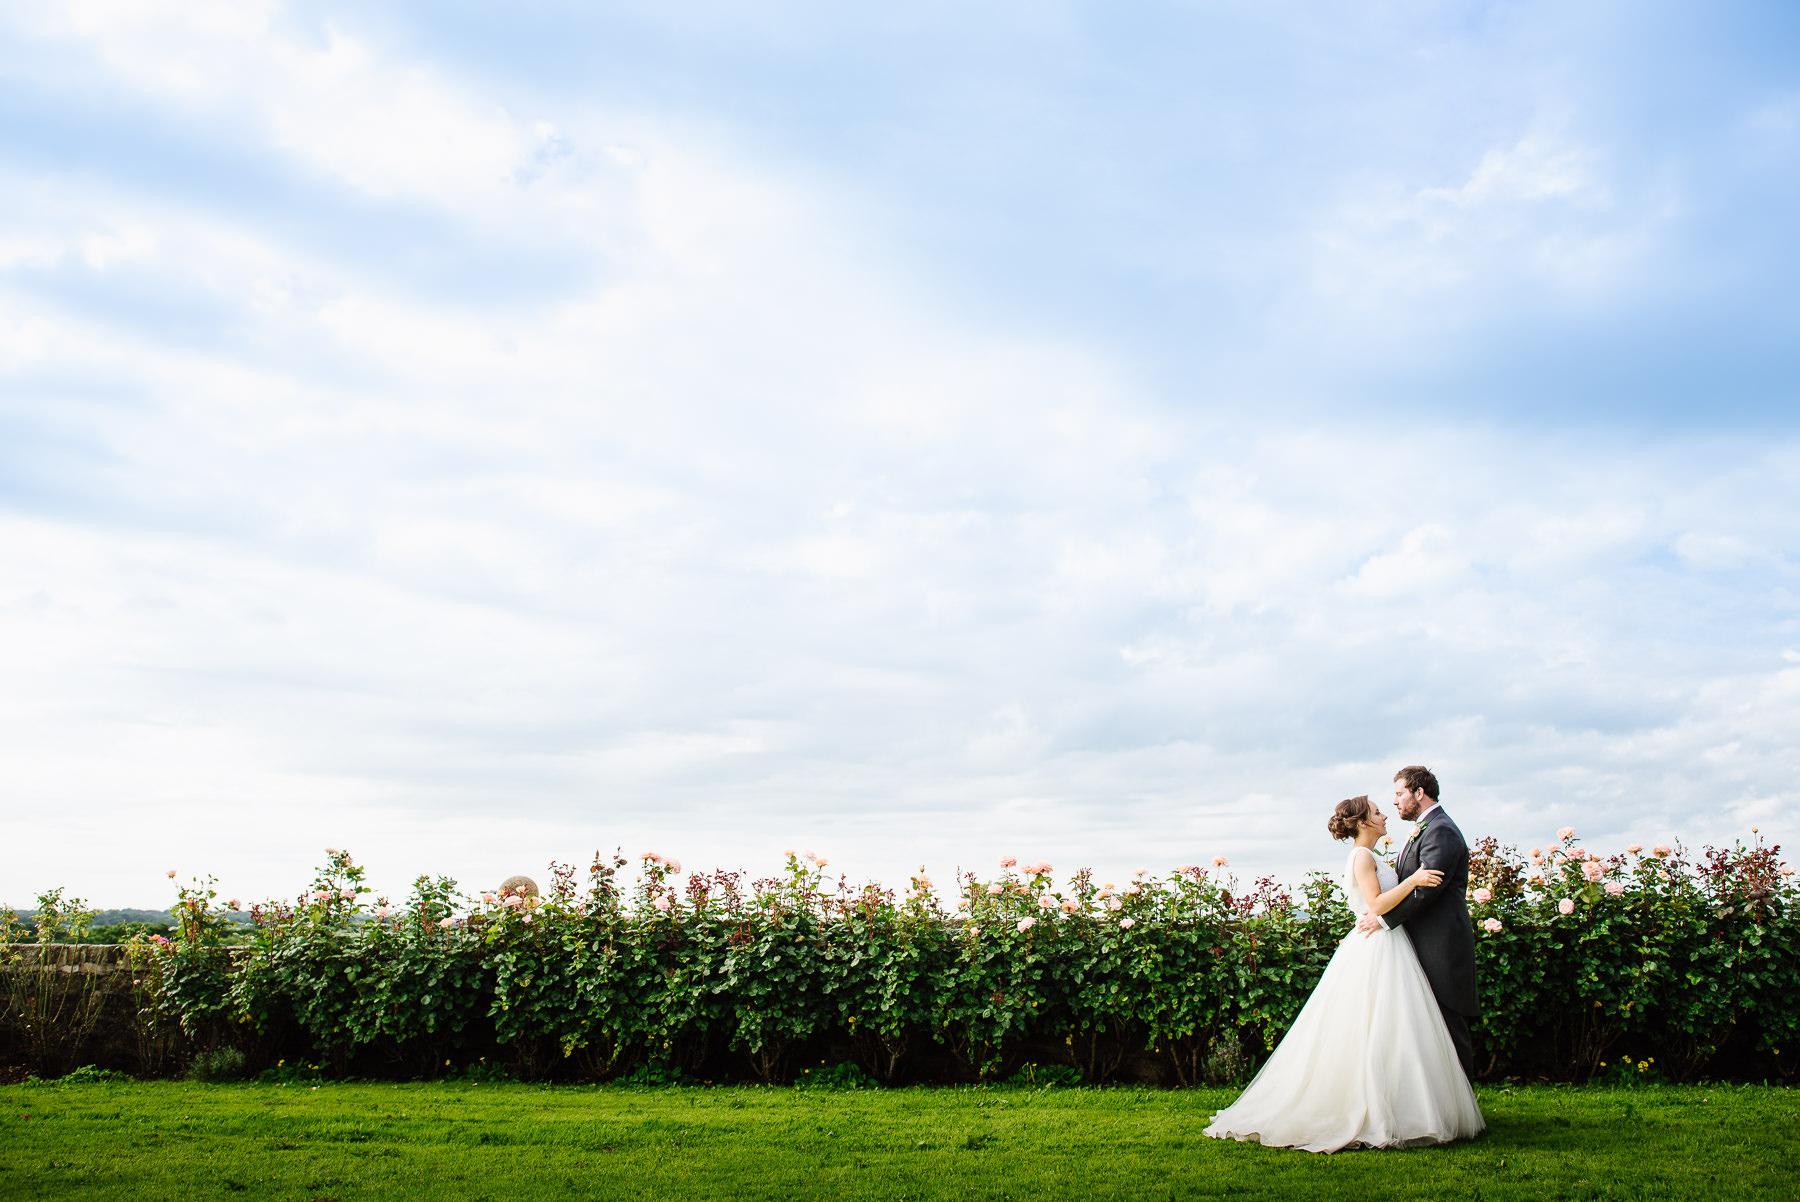 Wedding photograph at Beeston Manor